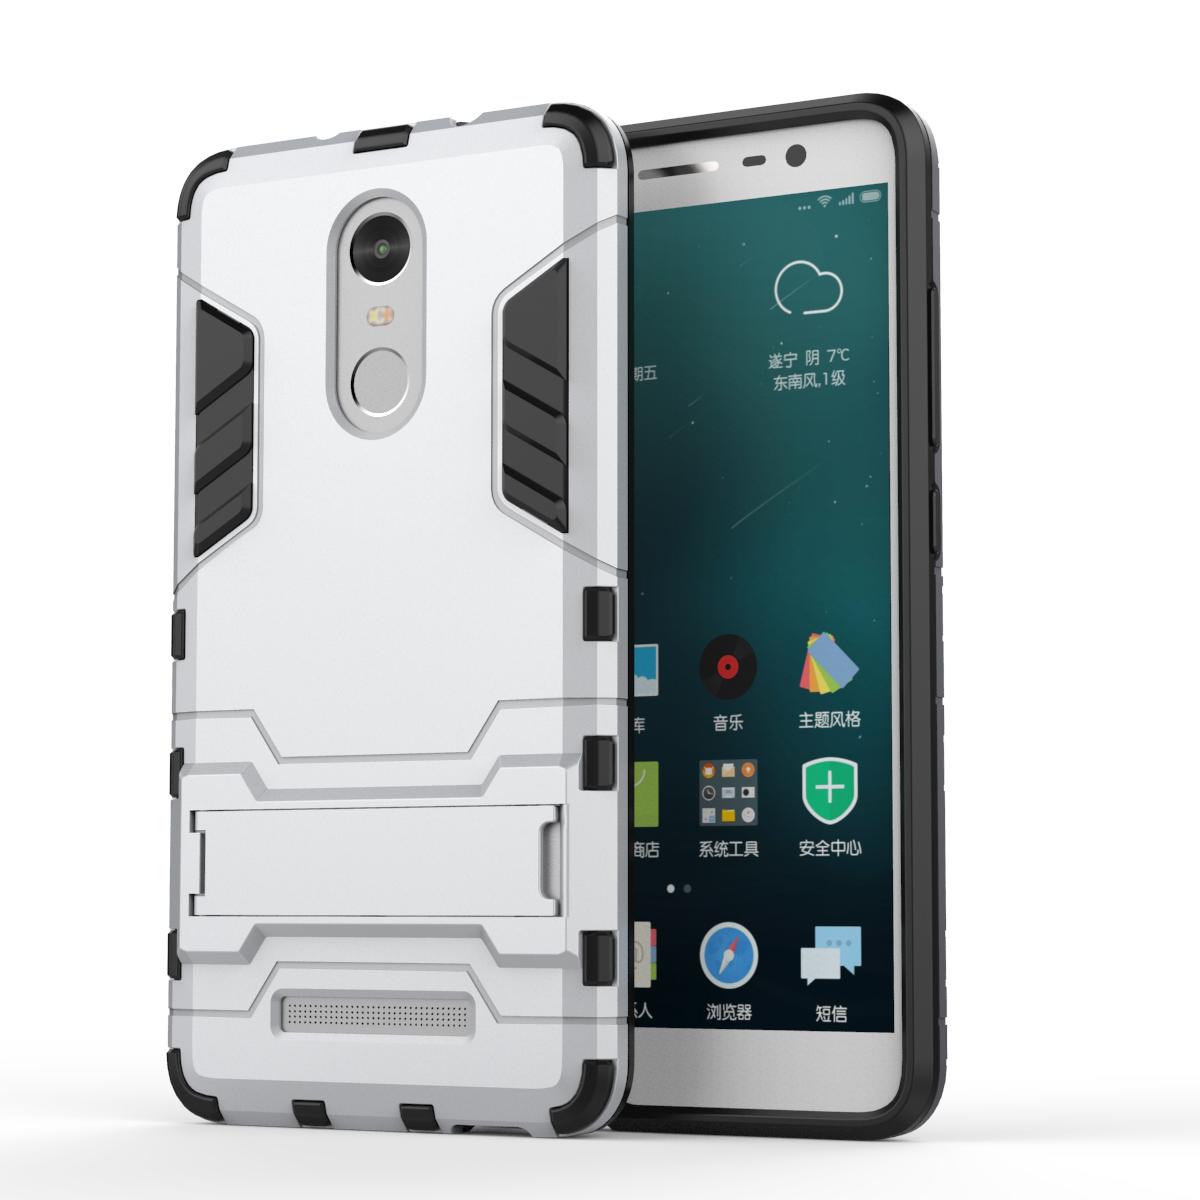 d273b4b3534 Case Xiaomi Redmi Note 3 Pro Cover Rubber Hard Phone Cover for Xiaomi Redmi  Note 3 Pro Case For Xiaomi Redmi Note 3 Pro